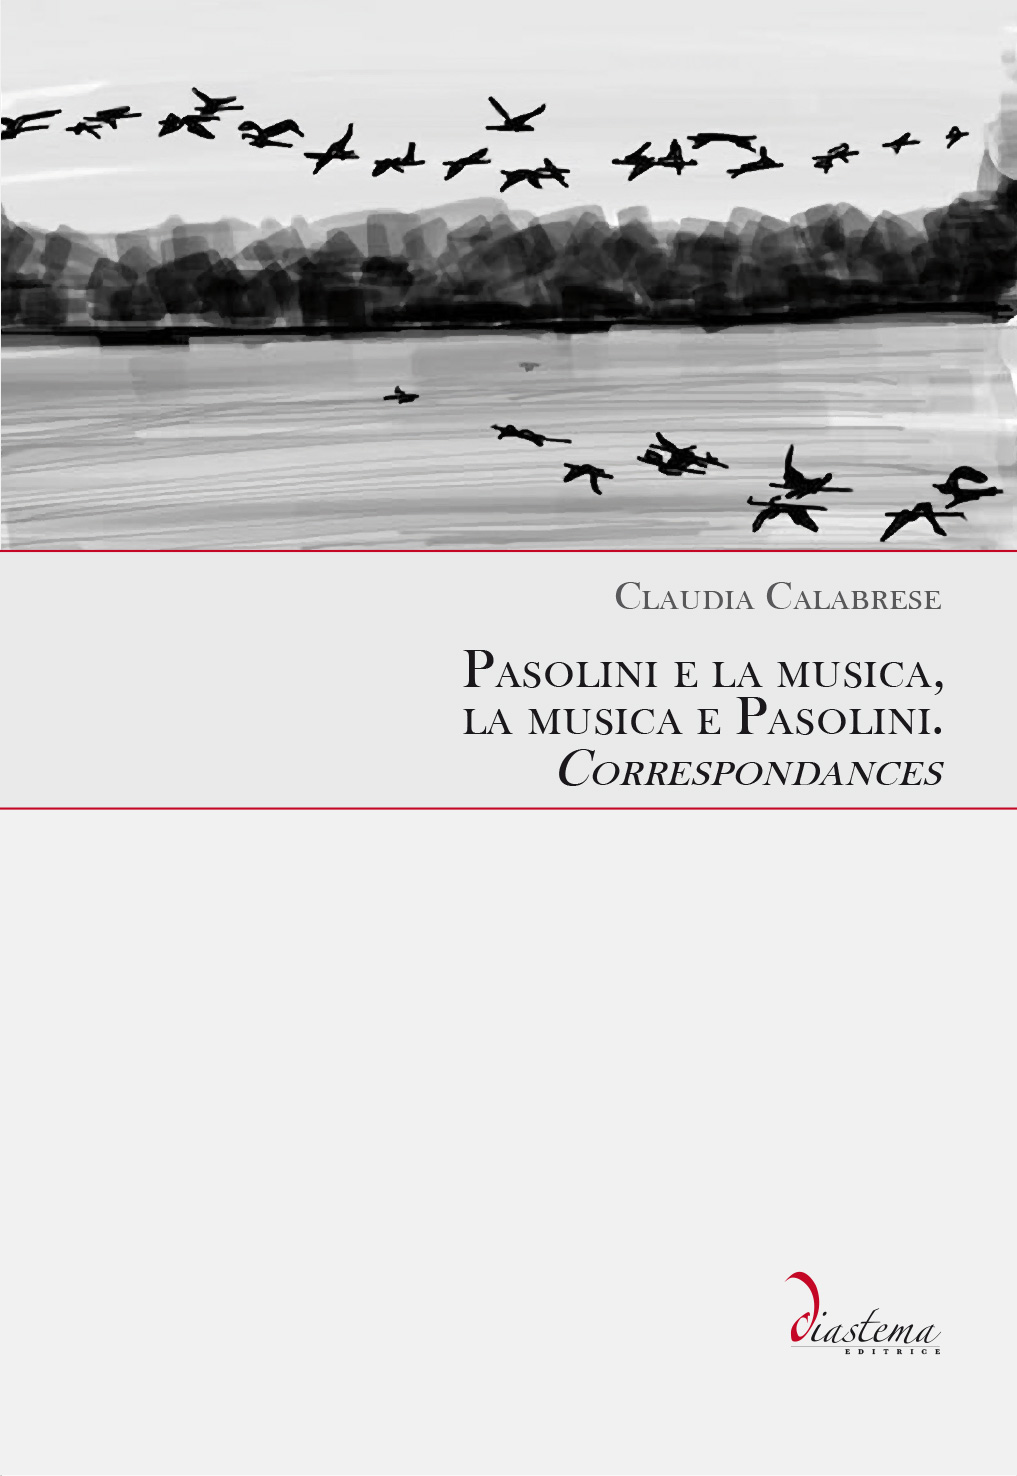 "Claudia Calabrese<p><span style=""color: #b21827;""><strong> Pasolini e la musica, la musica e Pasolini. </strong><br>Correspondances<br><span style=""color: #000000;"">Prefazione di Stefano La Via</strong></p>"